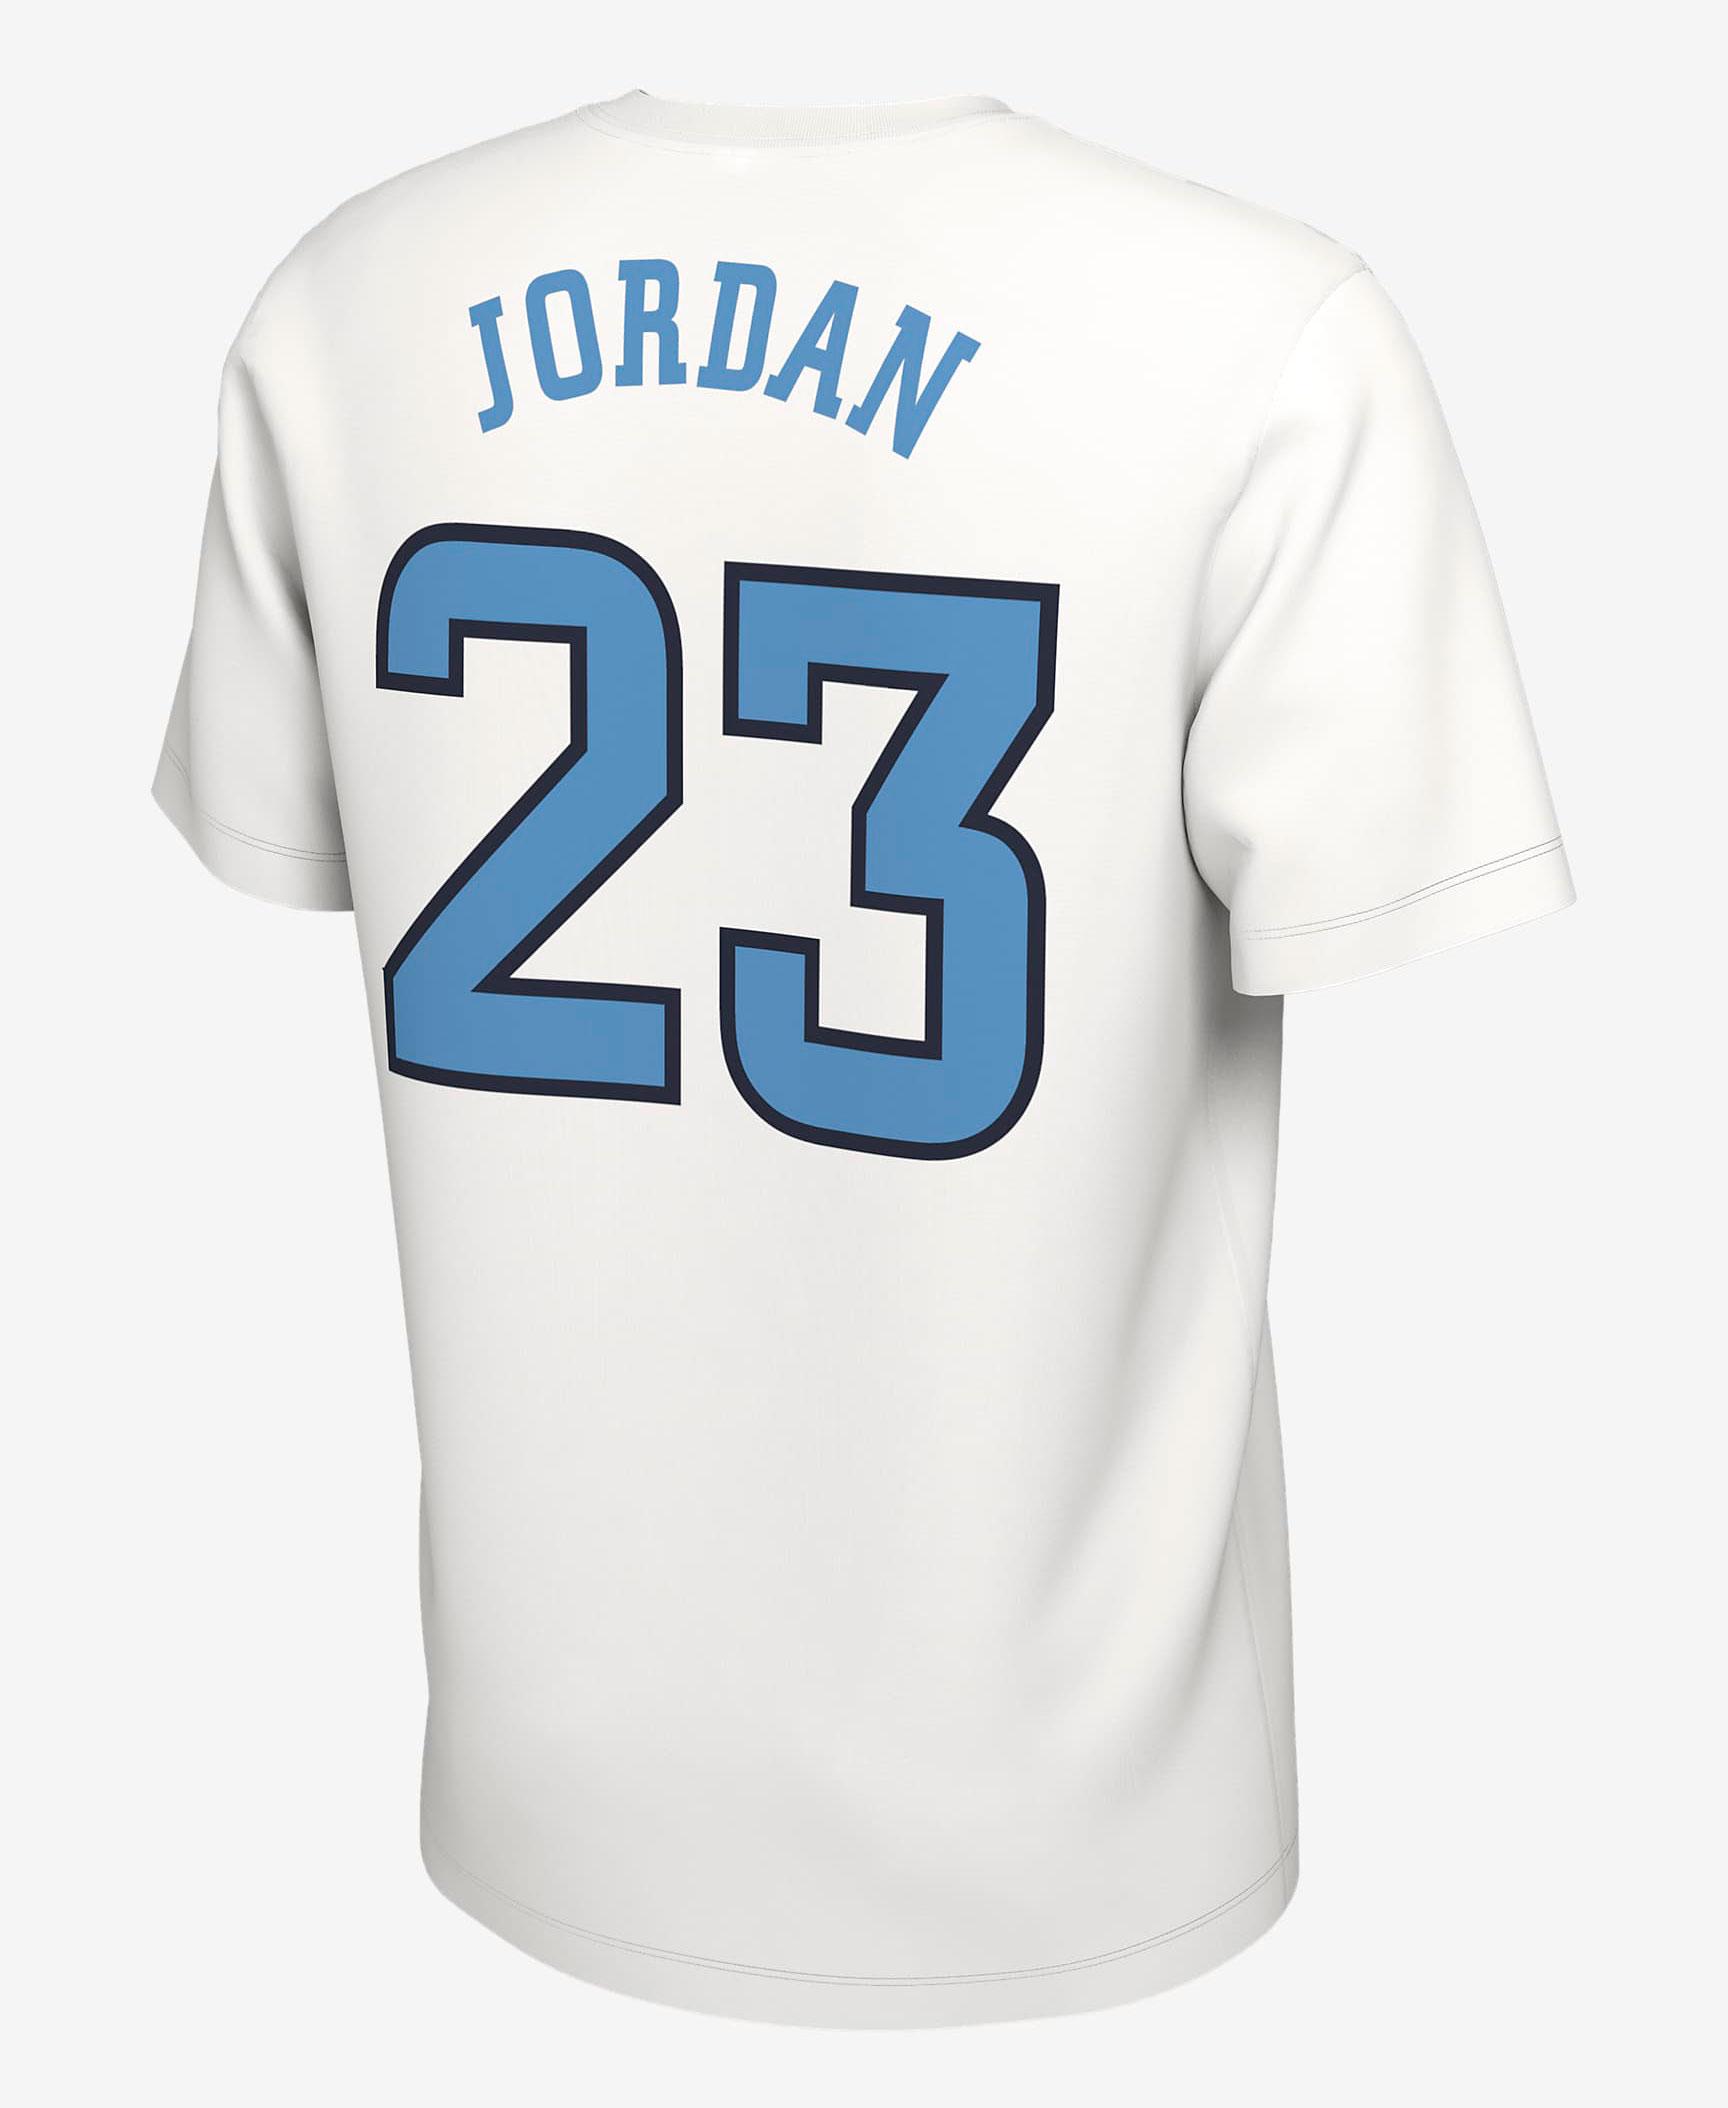 michael-jordan-unc-tar-heels-college-shirt-white-2